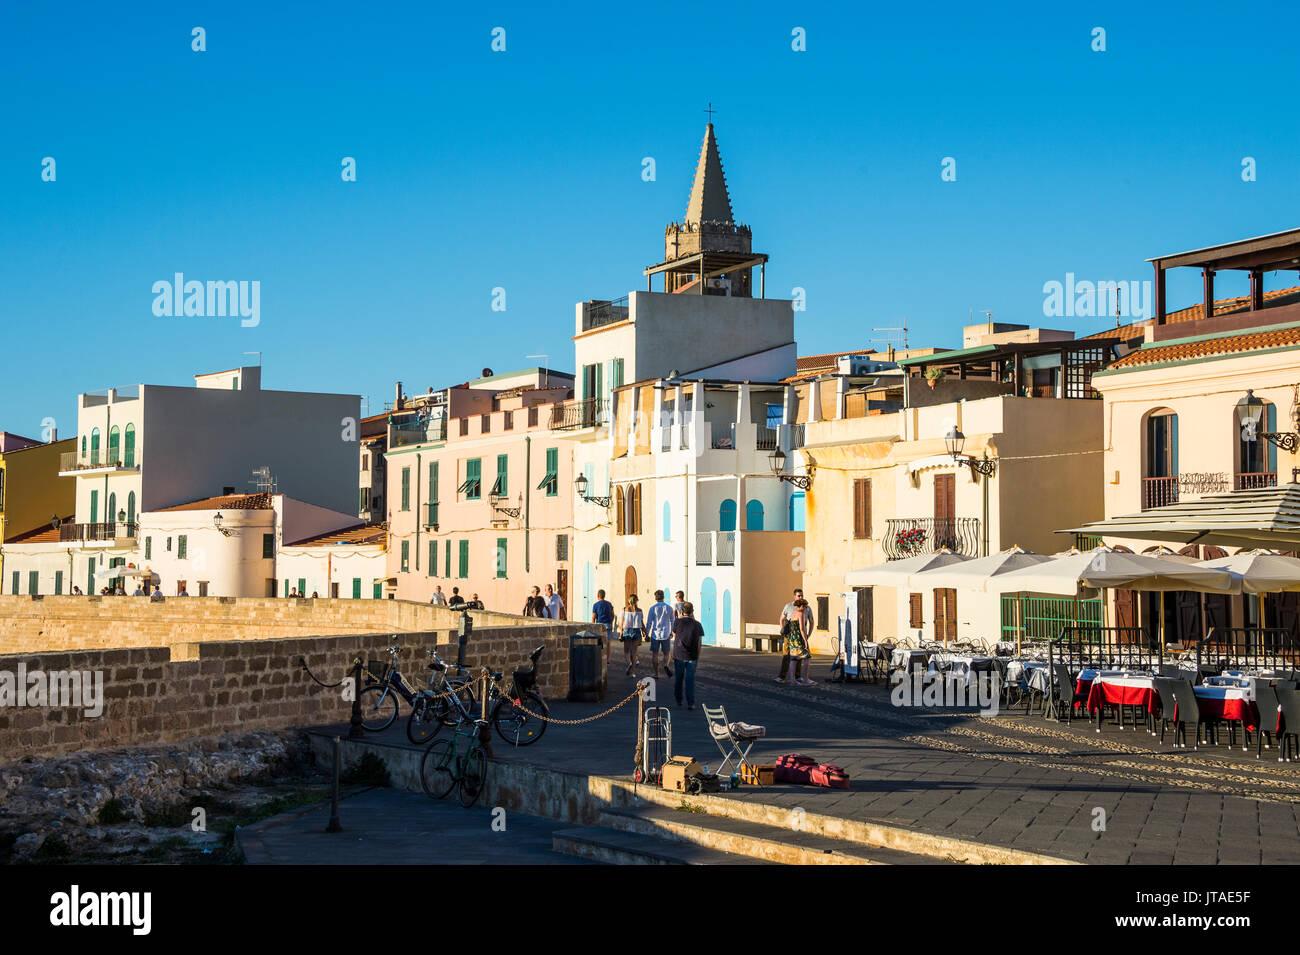 Ozean Promenade in der Küstenstadt Alghero, Sardinien, Italien, Mittelmeer, Europa Stockbild